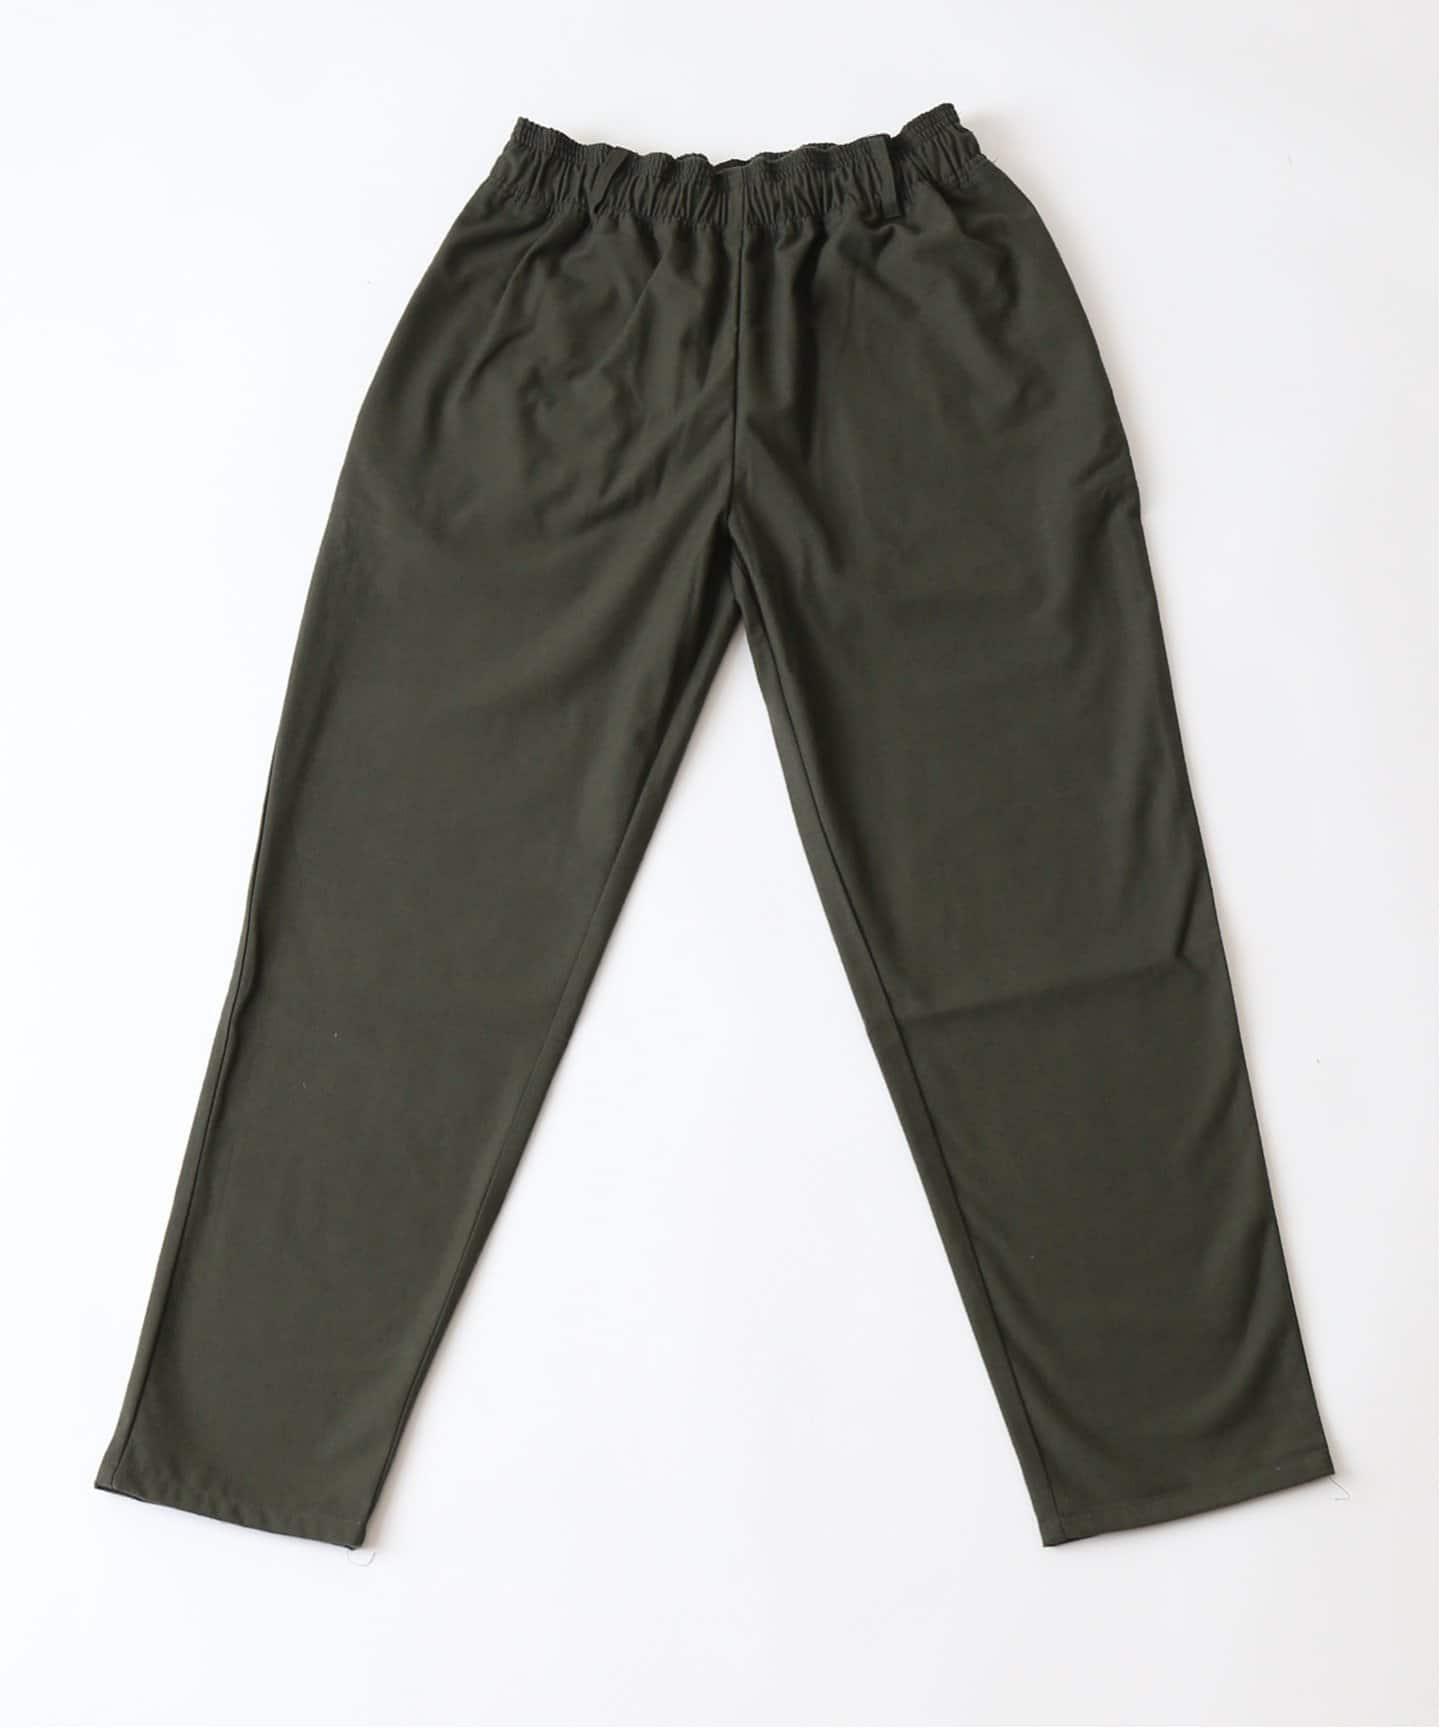 B.C STOCKのパンツ・ズボン/パンツ・ズボン全般|グリーン